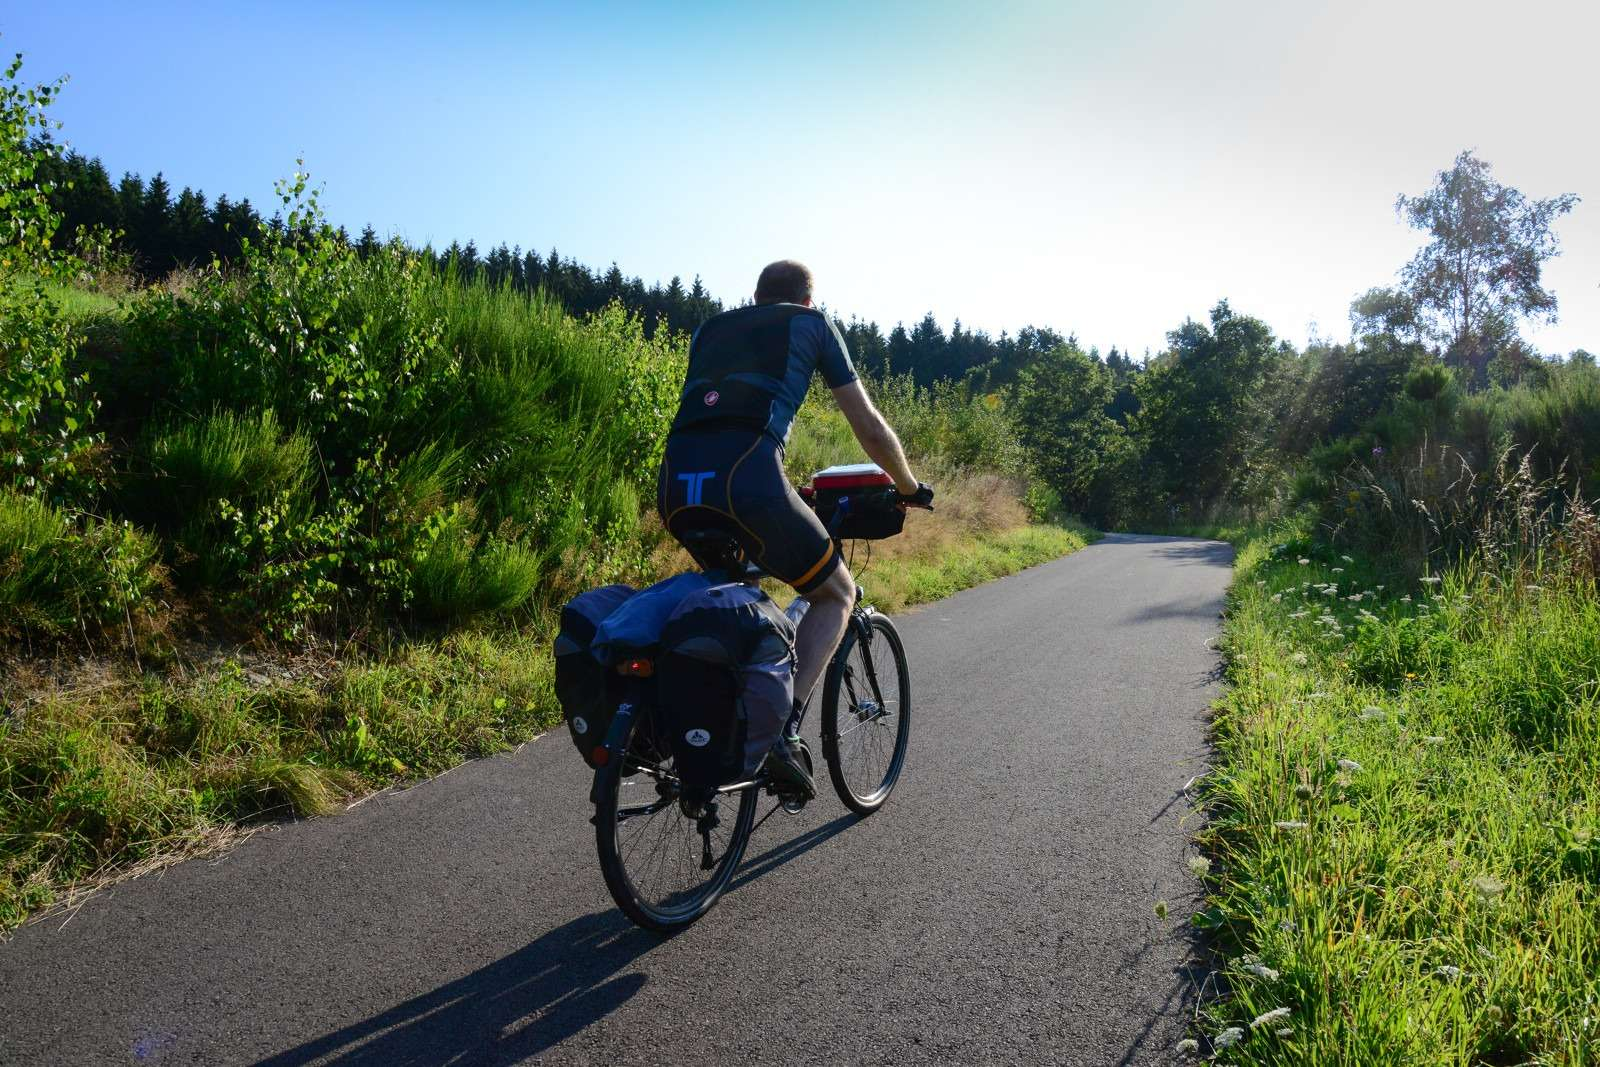 Aventures à vélo - VivrArdenne